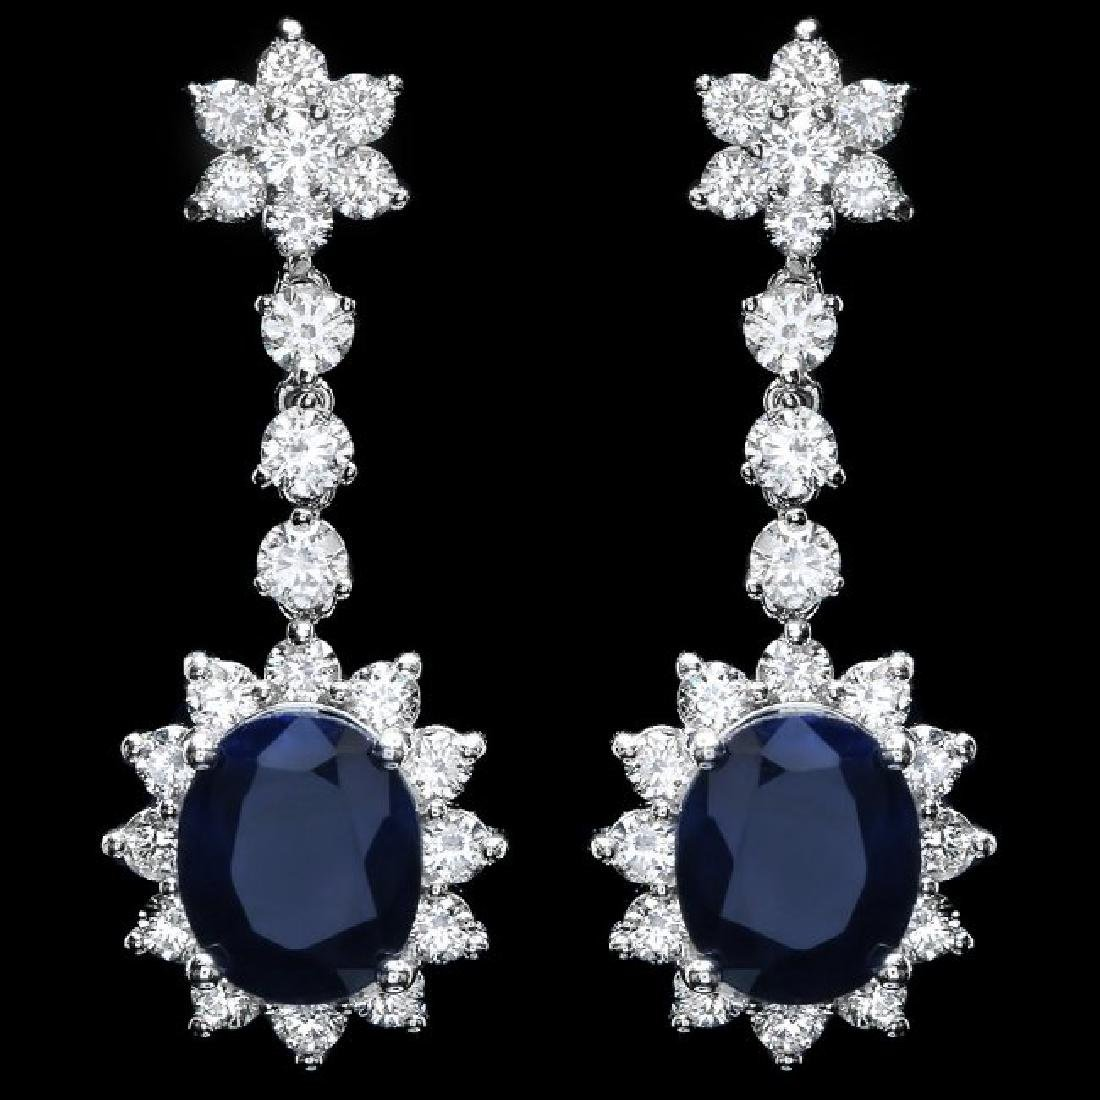 14k Gold 8.50ct Sapphire 3.30ct Diamond Earrings